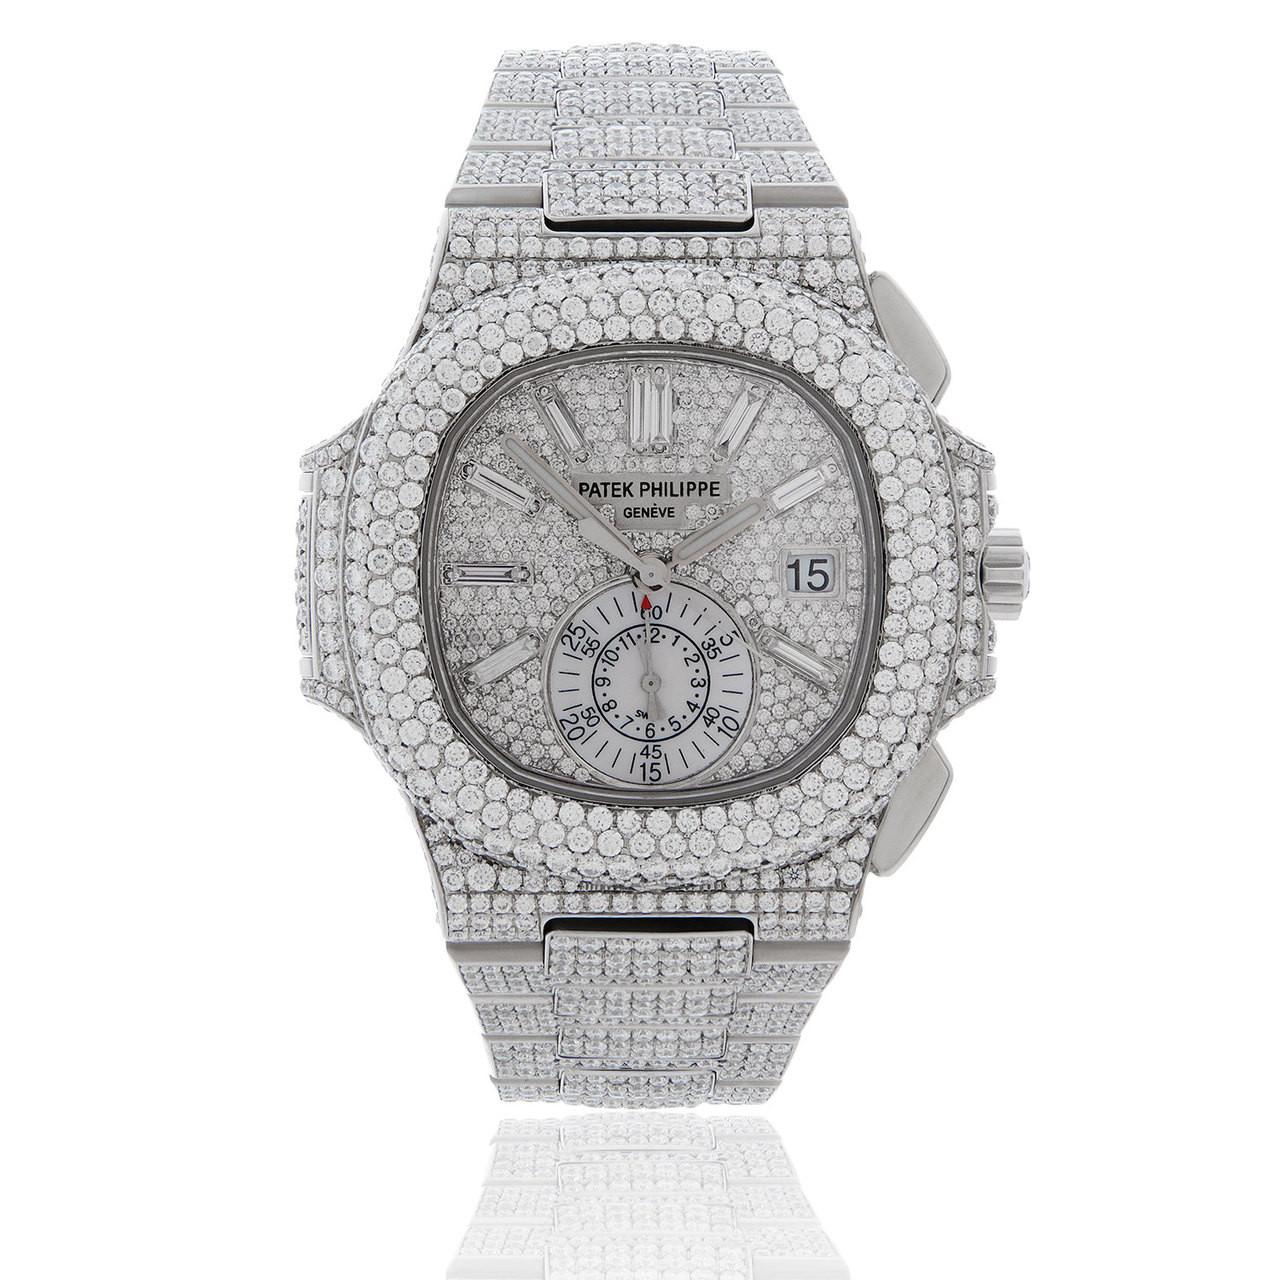 d15fbe64fcd Patek Philippe Nautilus 5980 27.8ct Diamond Men's Watch - Shyne Jewelers